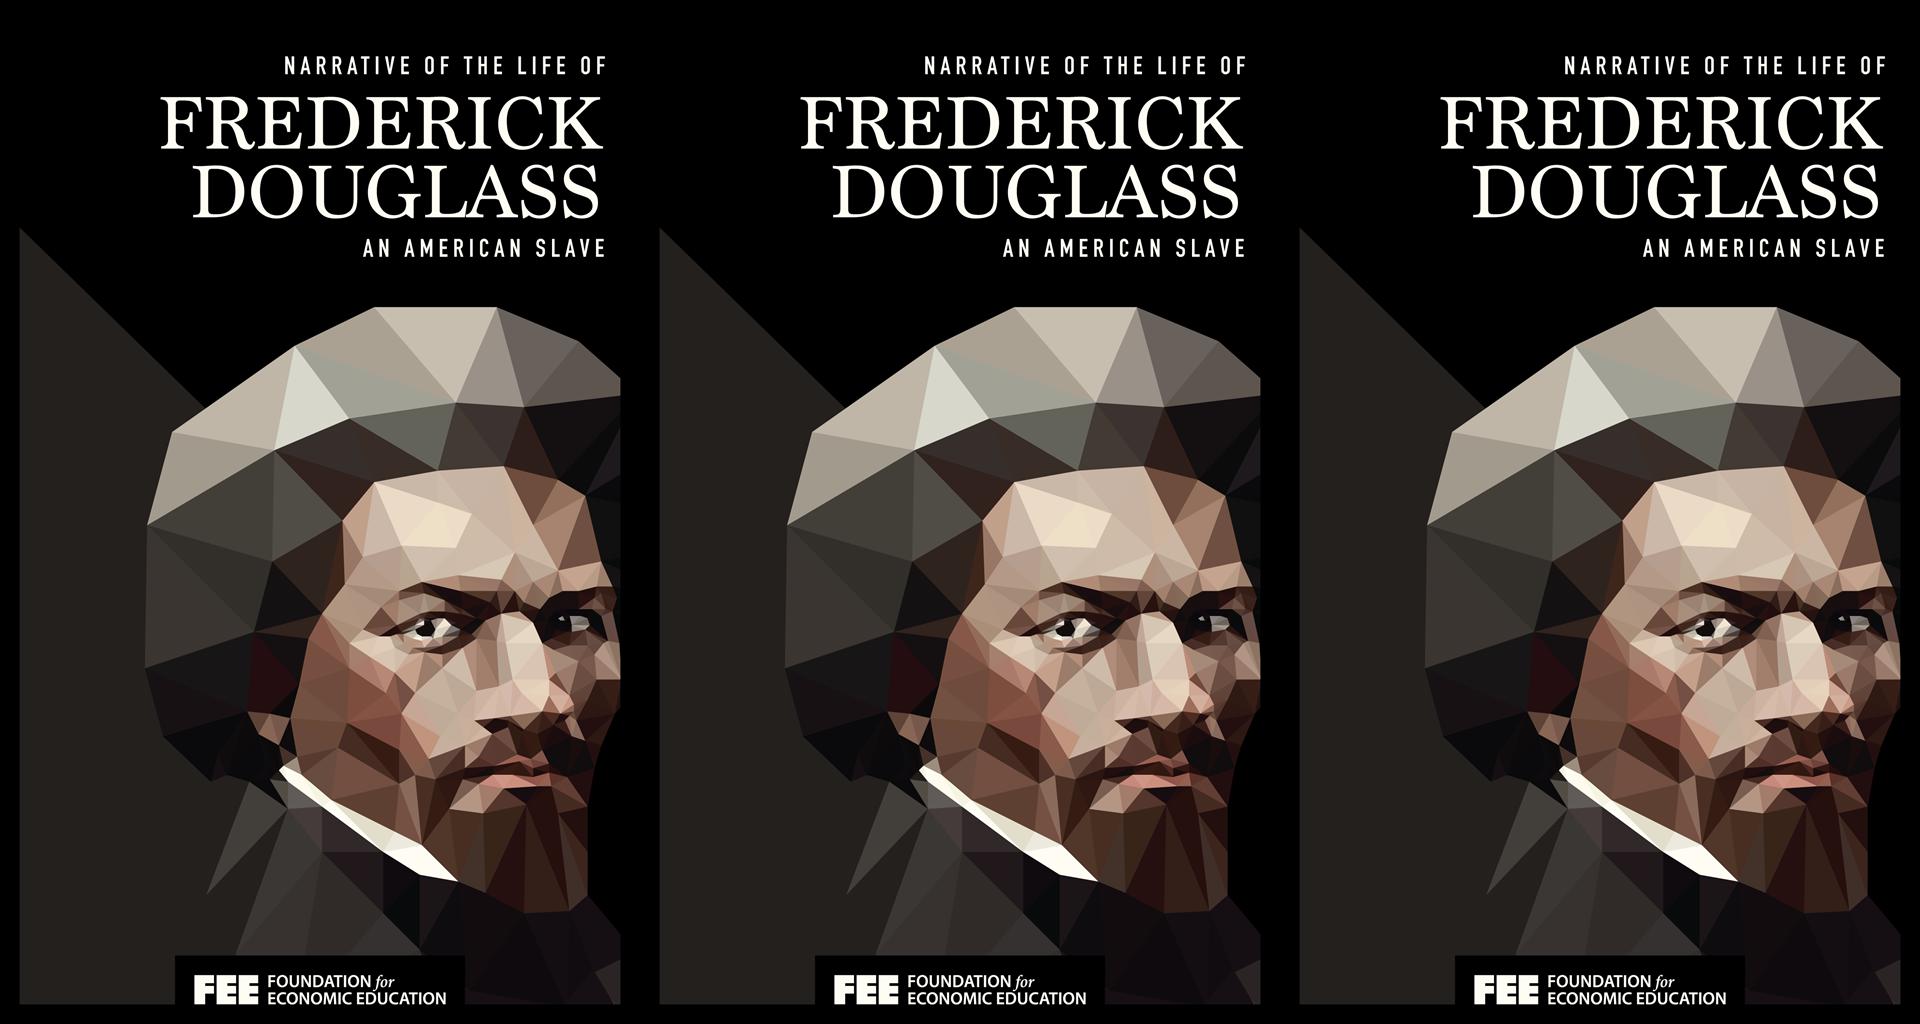 8f6e10f248 Narrative of the Life of Frederick Douglass  An American Slave ...